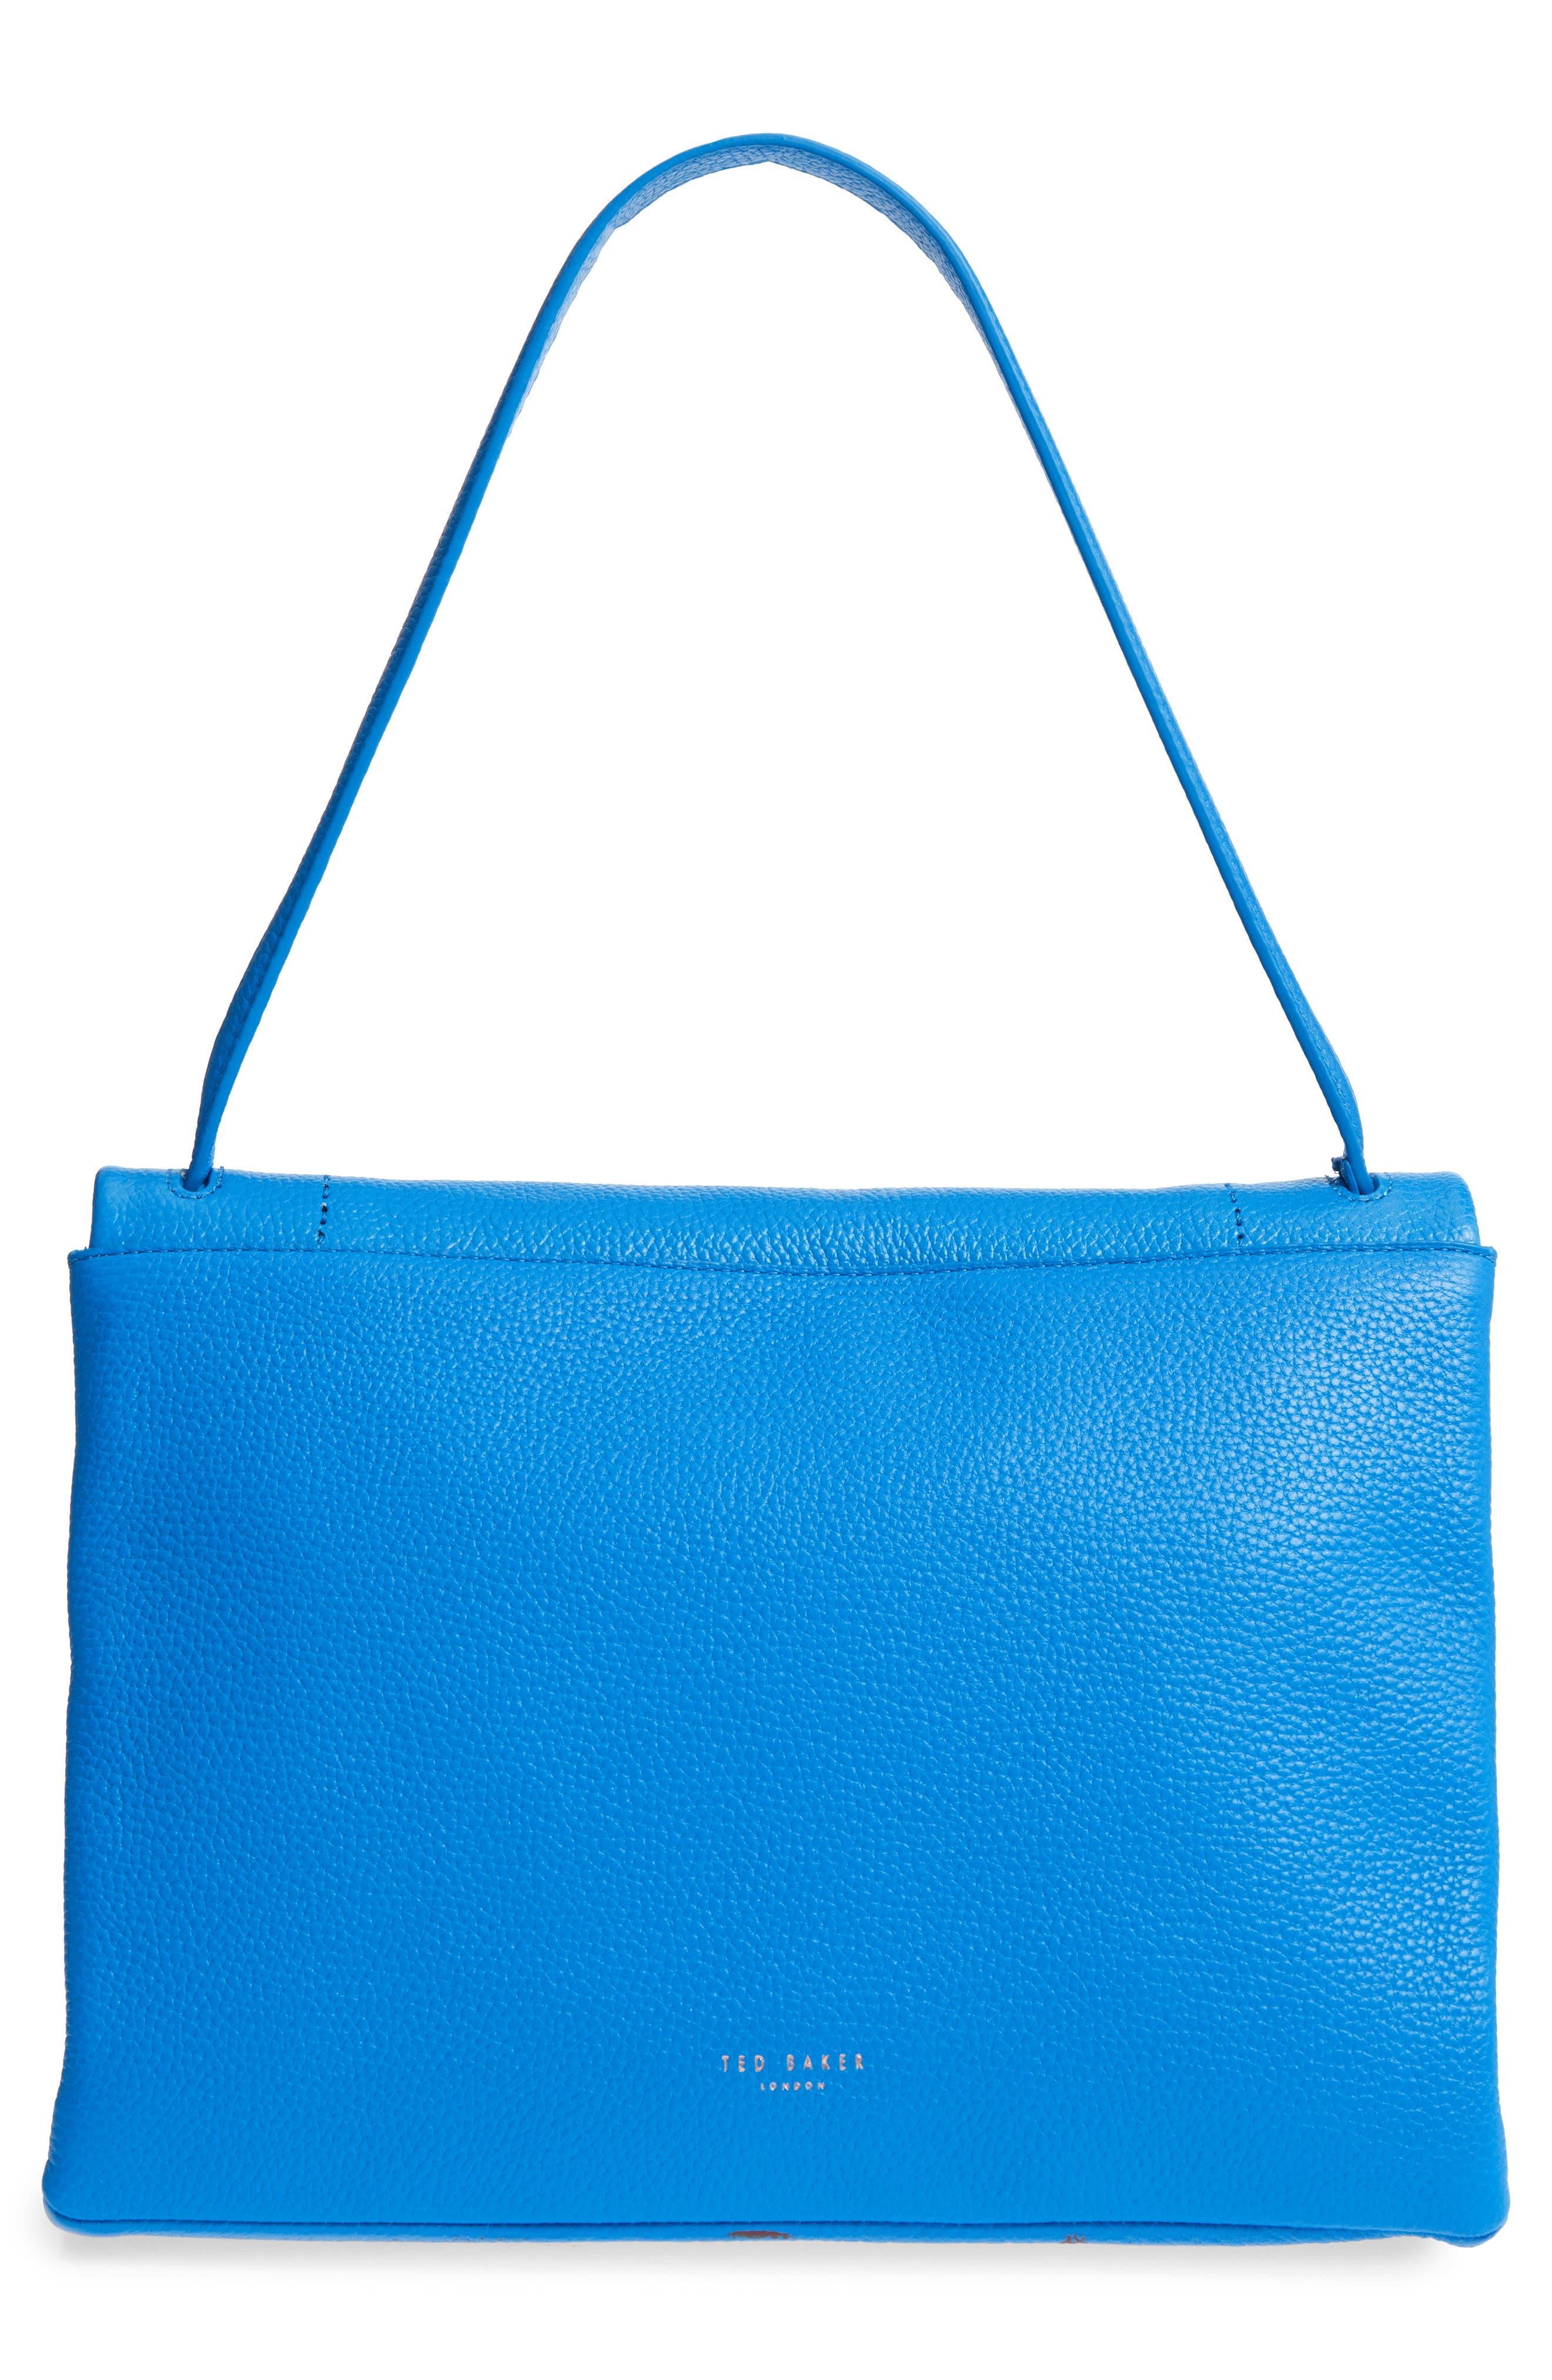 Heeidi Harmony Print Leather Shoulder Bag,                             Alternate thumbnail 3, color,                             430